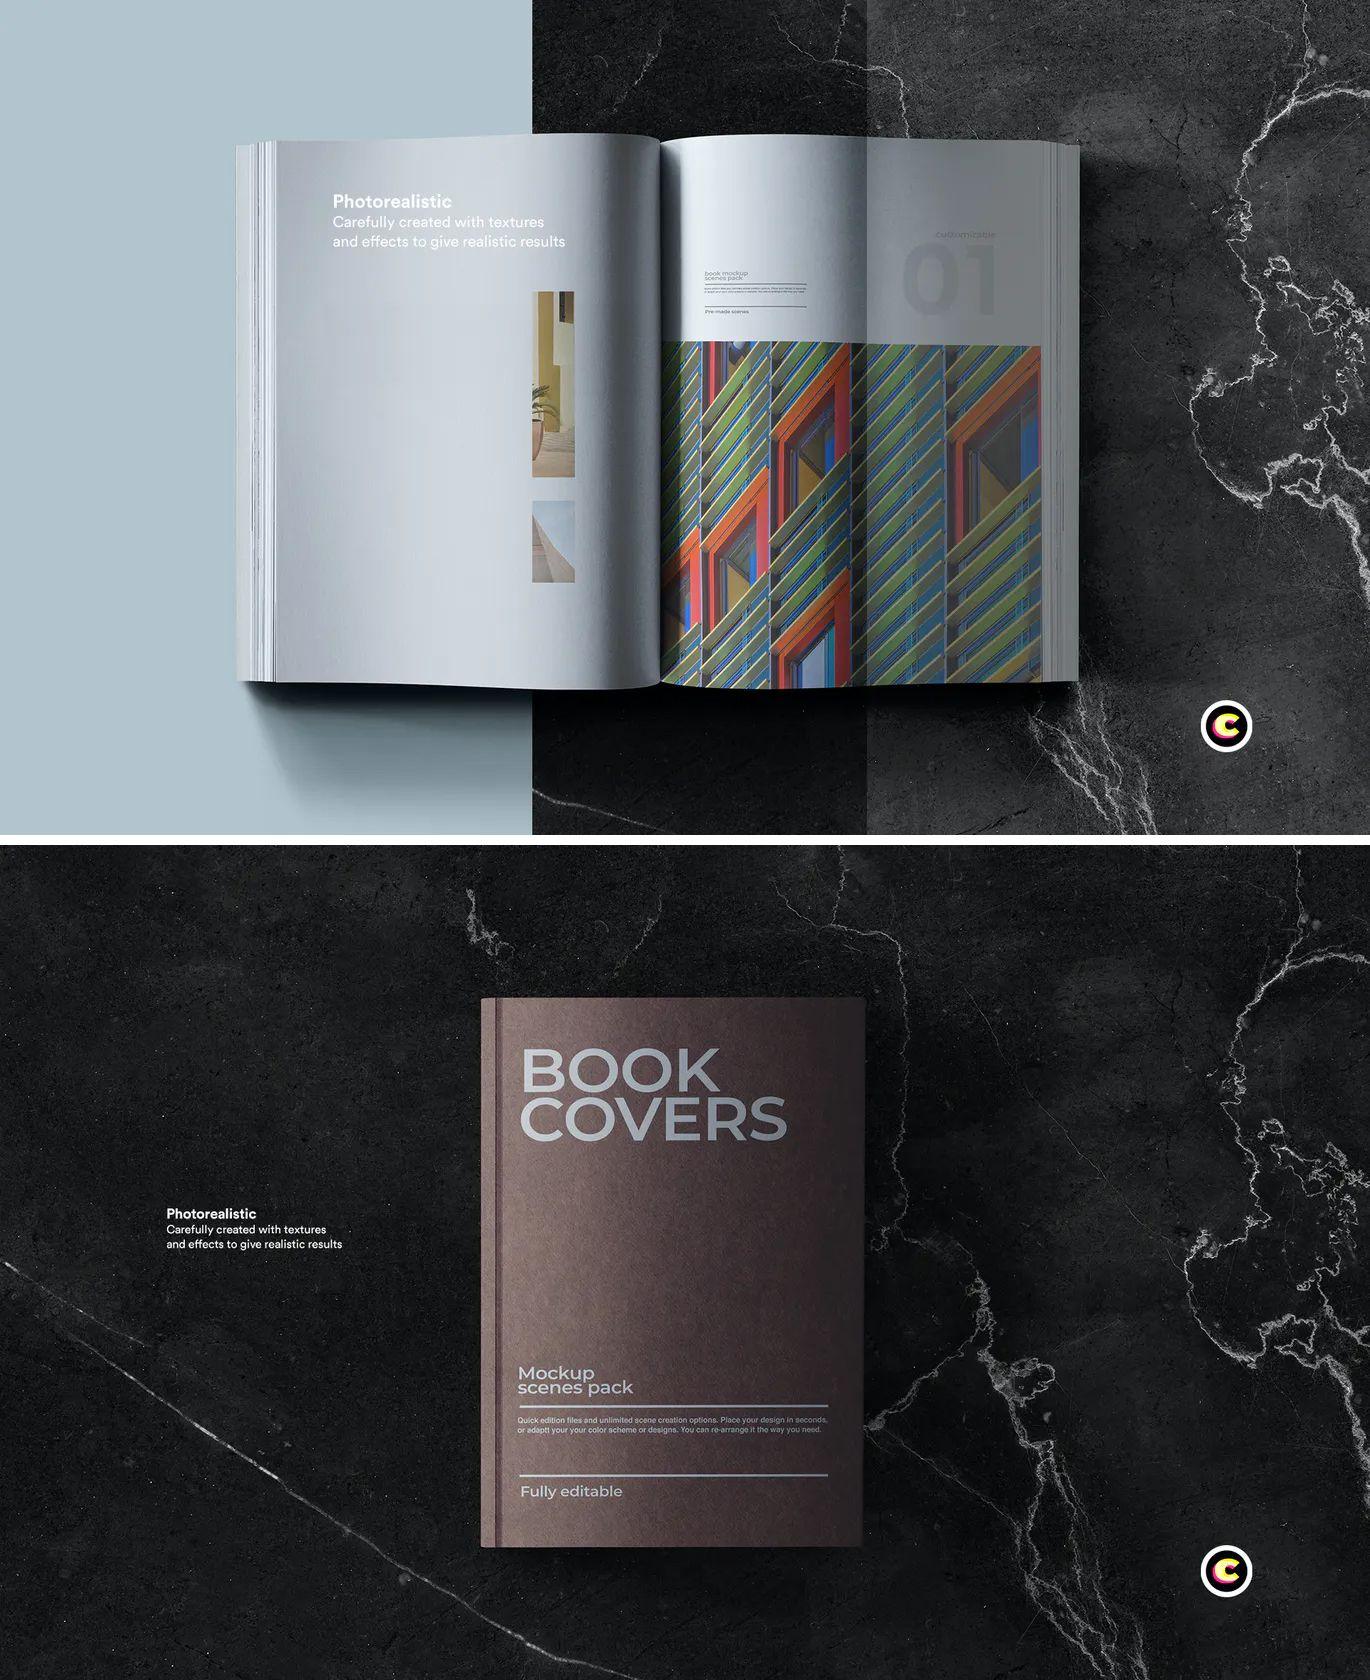 Book Mock Up Psd 06 Psd Files Books Design Template Mockup